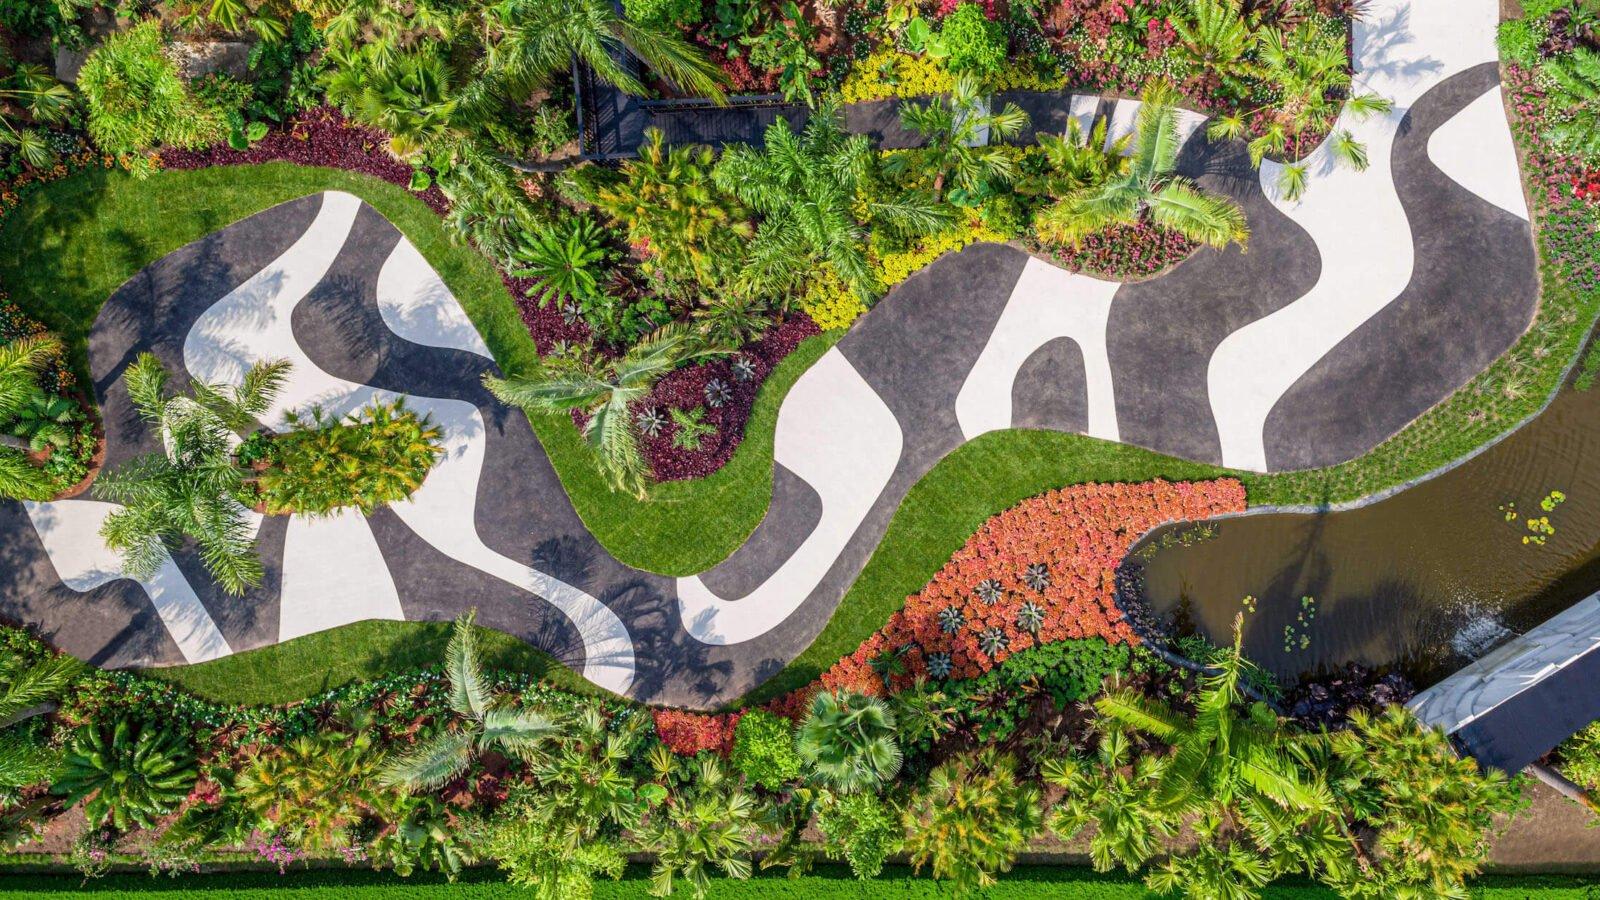 Roberto Burle Marx, Living Art, aerial view of the New York Botanical Garden exhibition